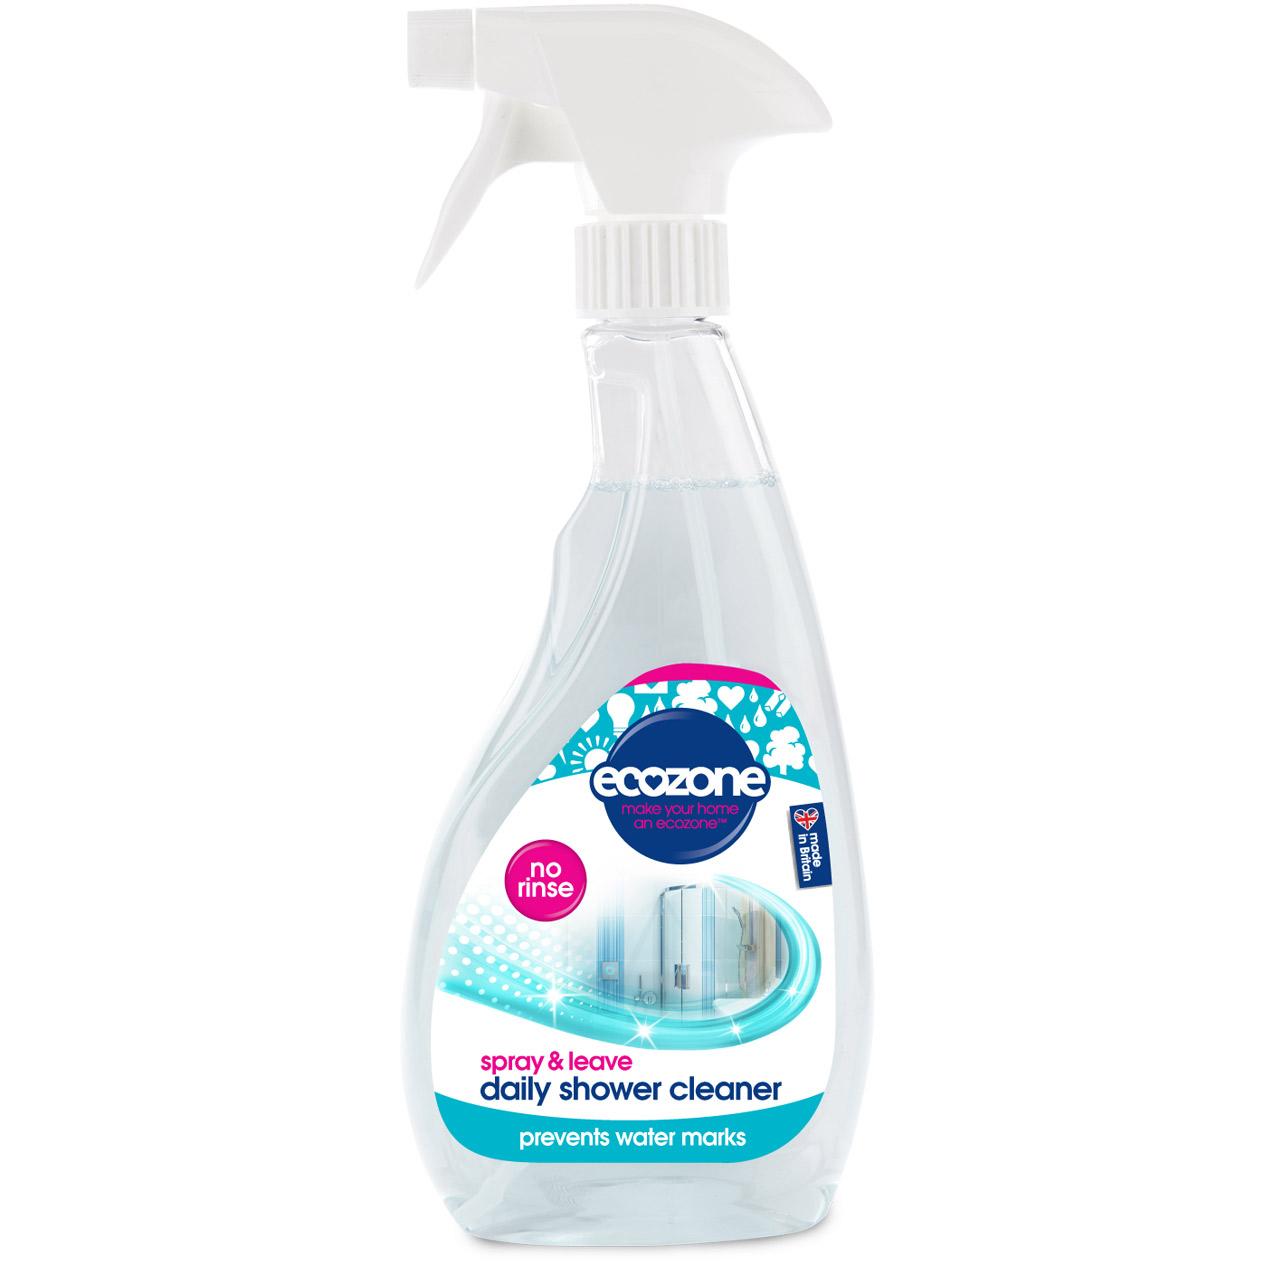 Ecozone Daily Shower Cleaner Spray - 500ml